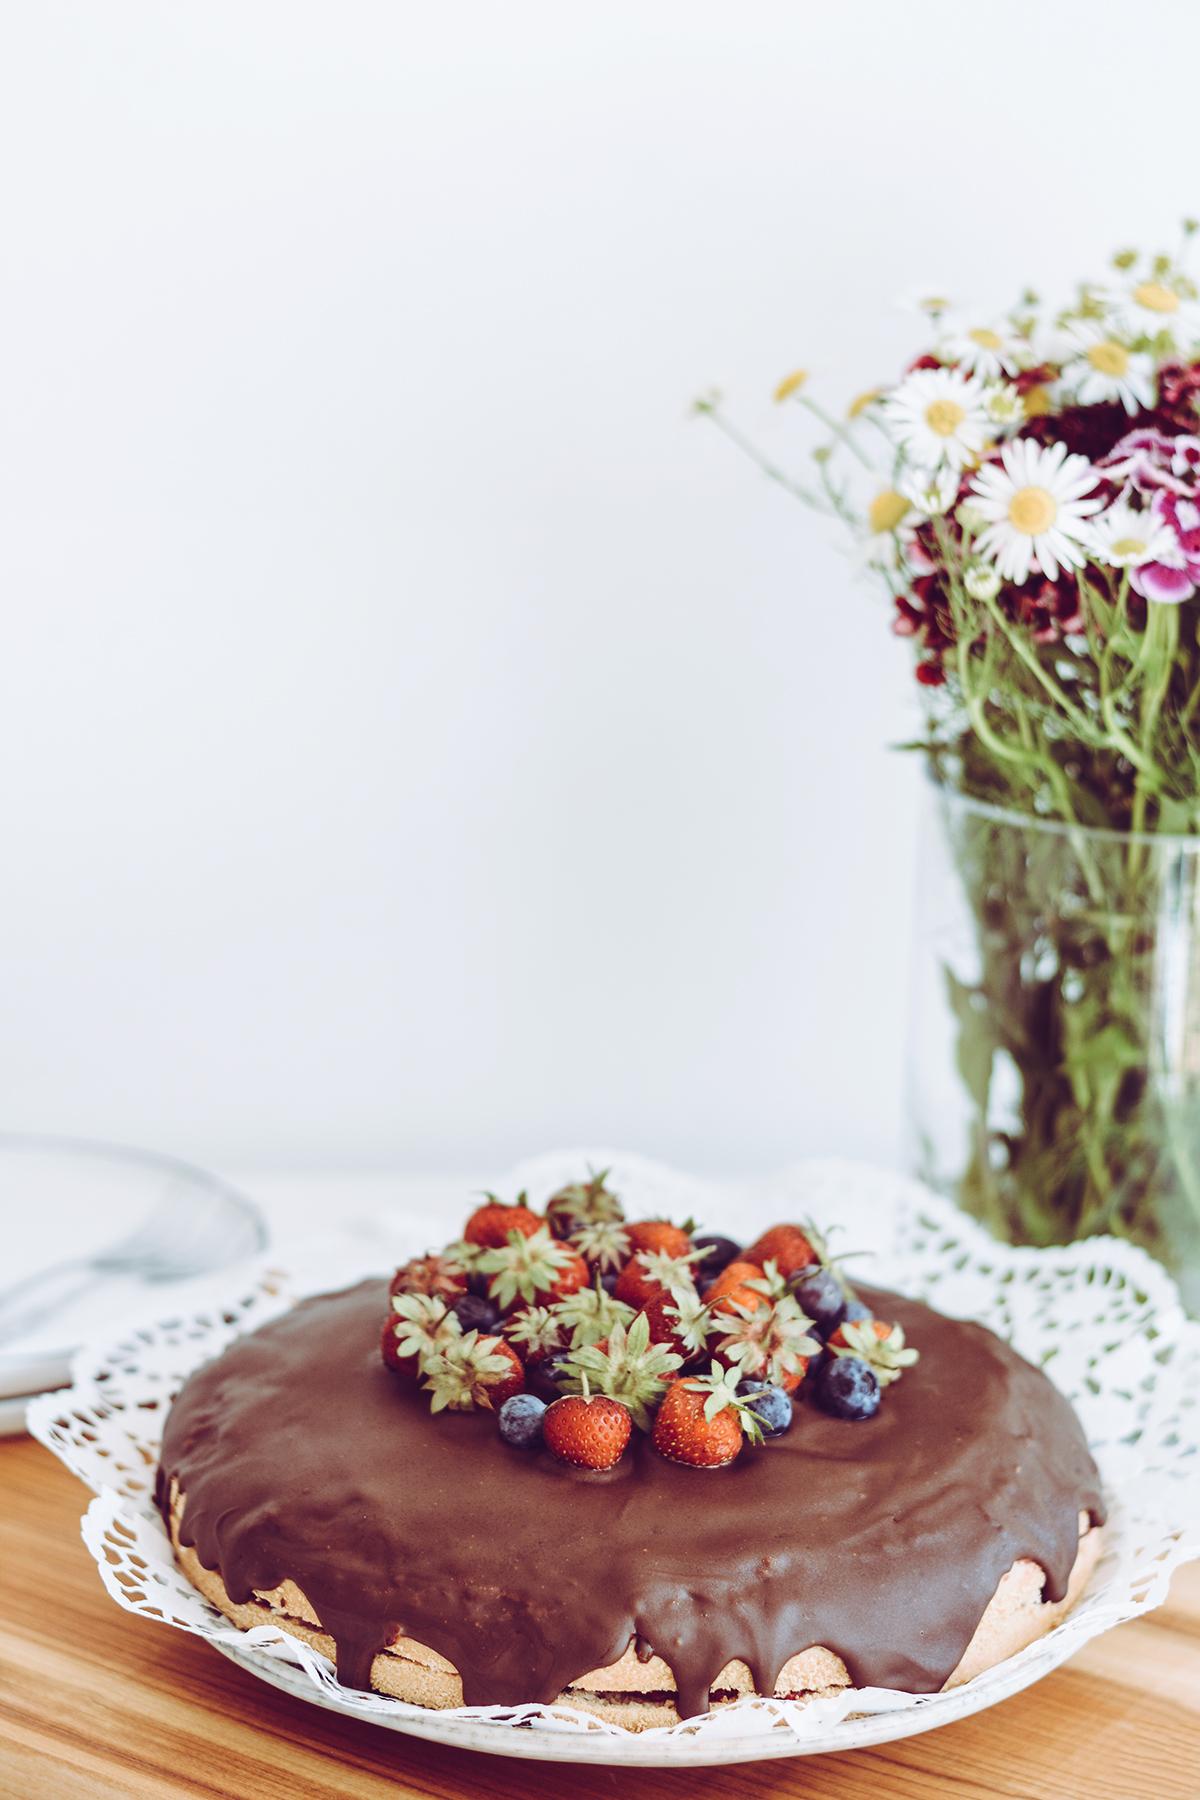 Erdbeer-Zitronentorte vegan | Pixi mit Milch